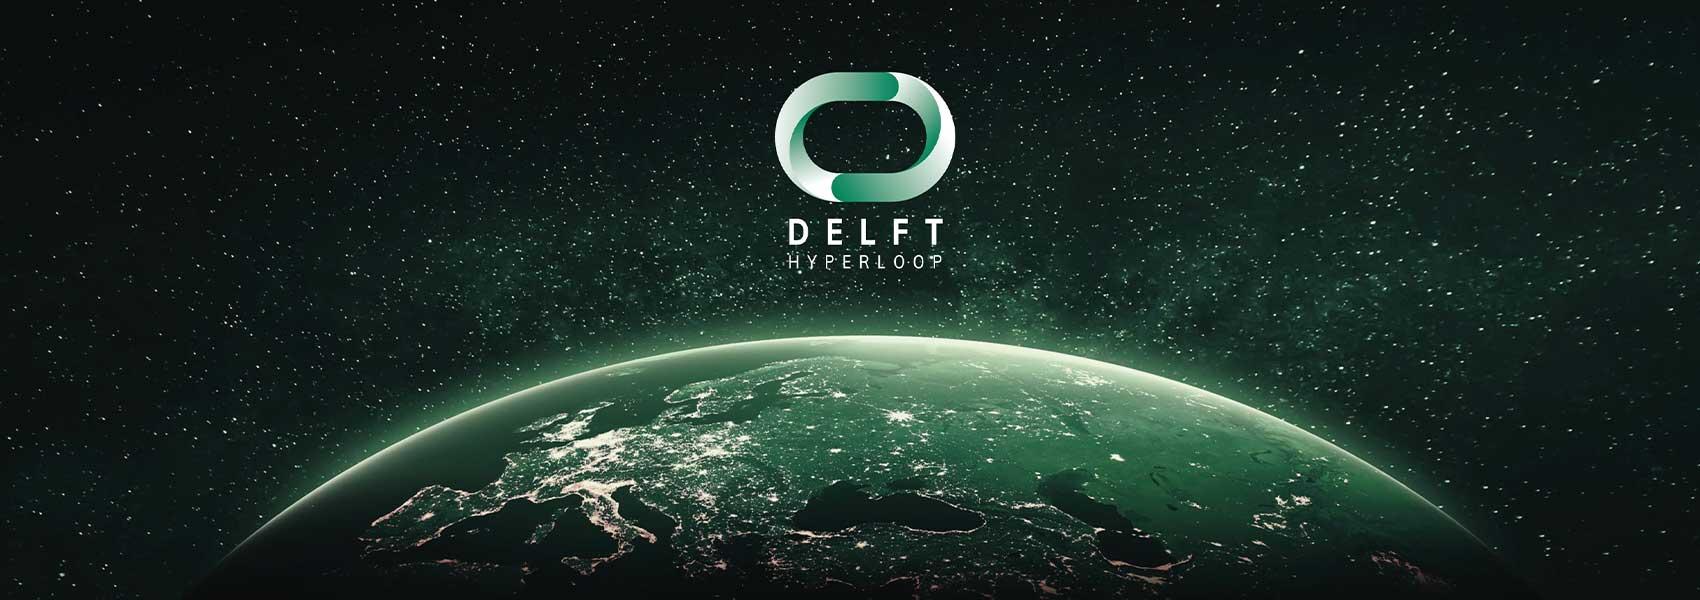 Defly Hyperloop Blog Banner